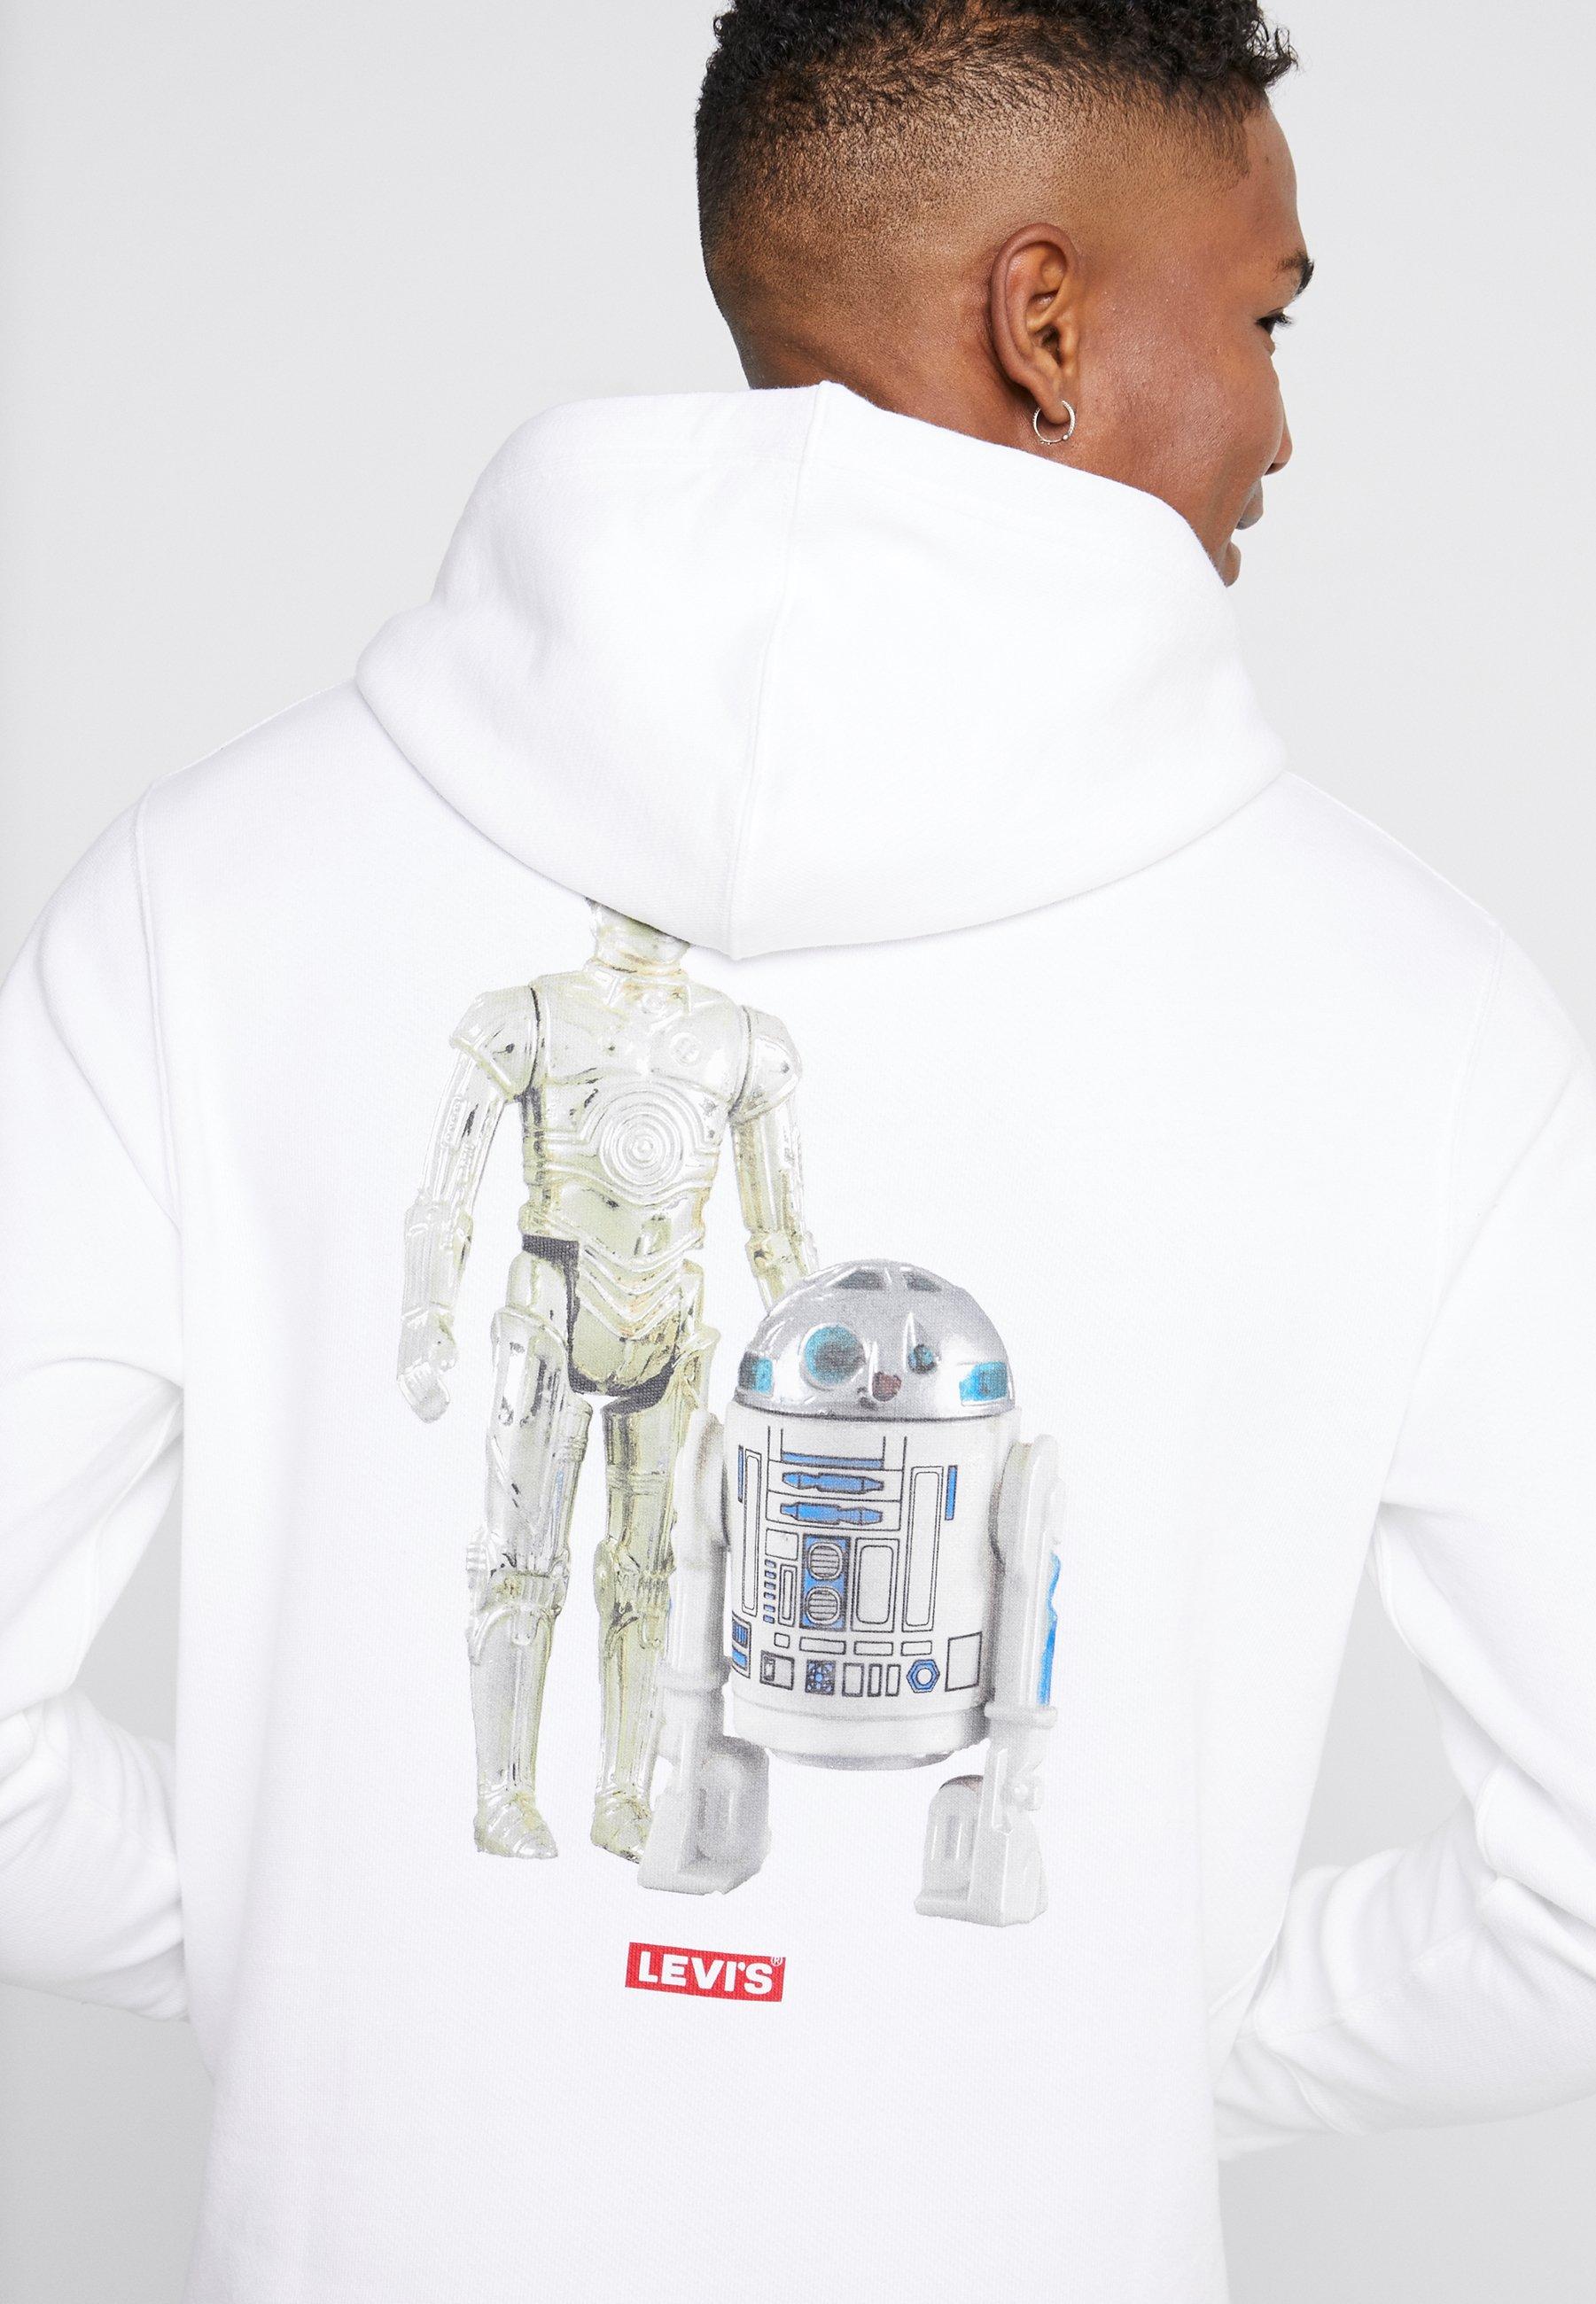 Kaikki Vuodenajat Saatavilla Miesten vaatteet Sarja dfKJIUp97454sfGHYHD Levi's® LEVI'S® X STAR WARS GRAPHIC PO HOODIE Huppari androids white